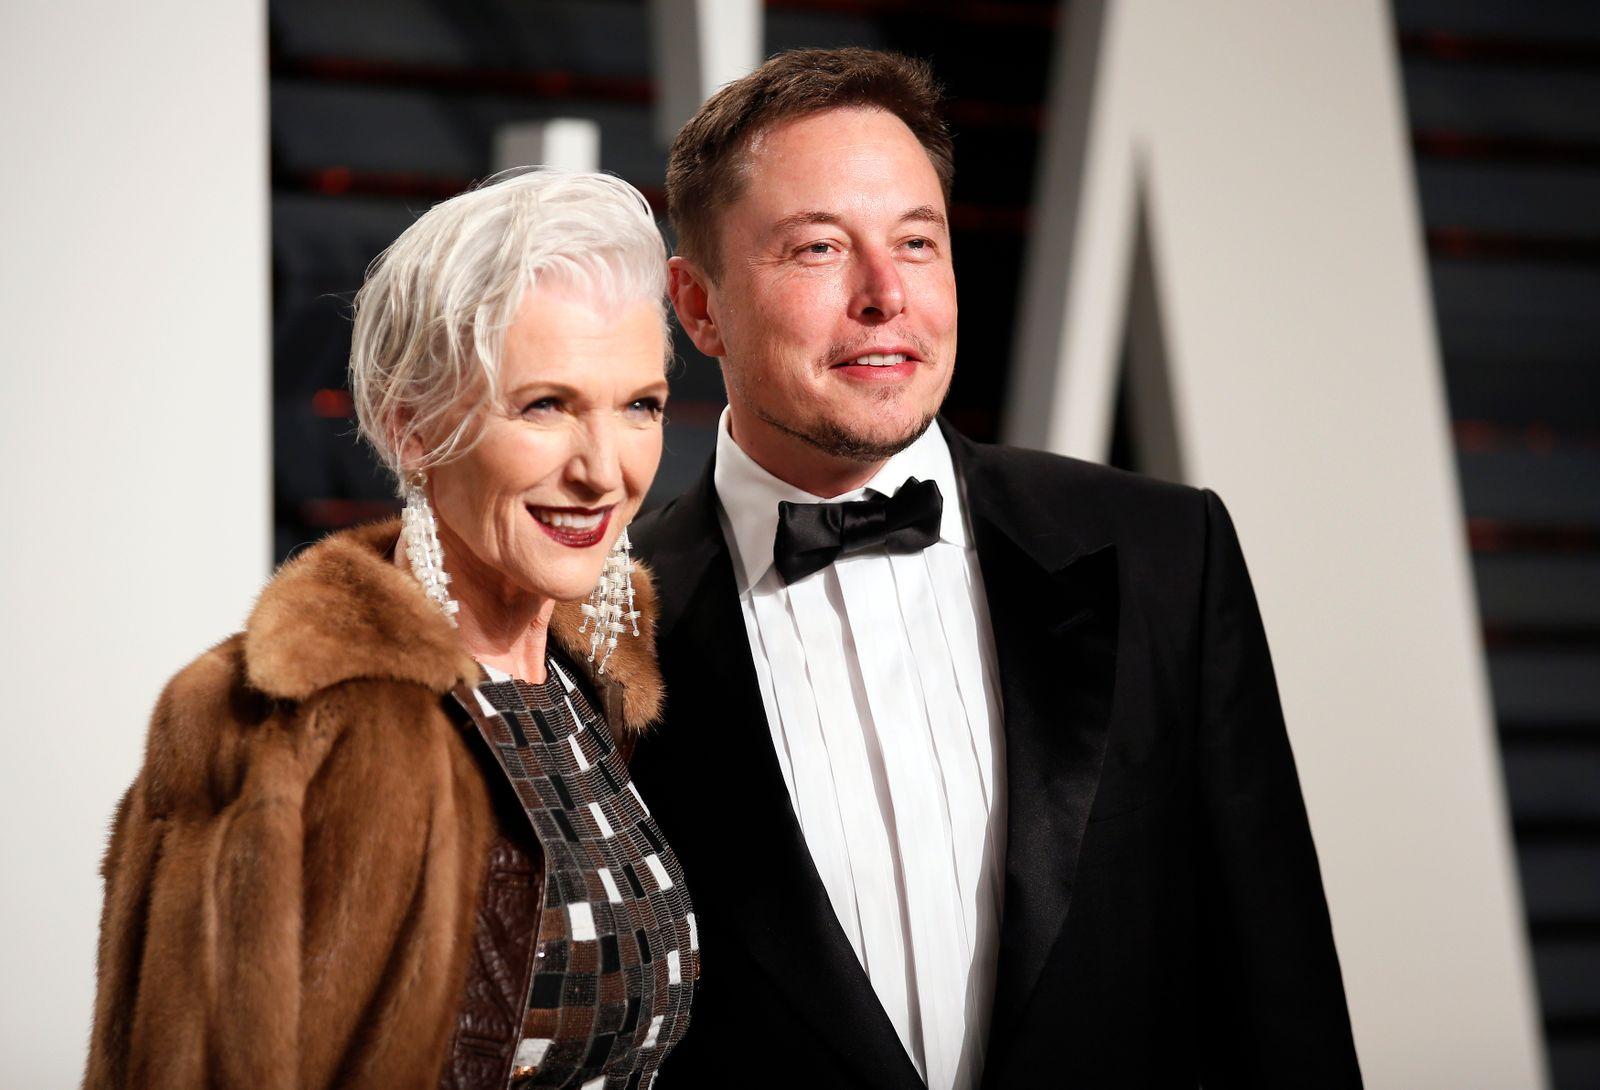 Maye Musk / Elon Musk